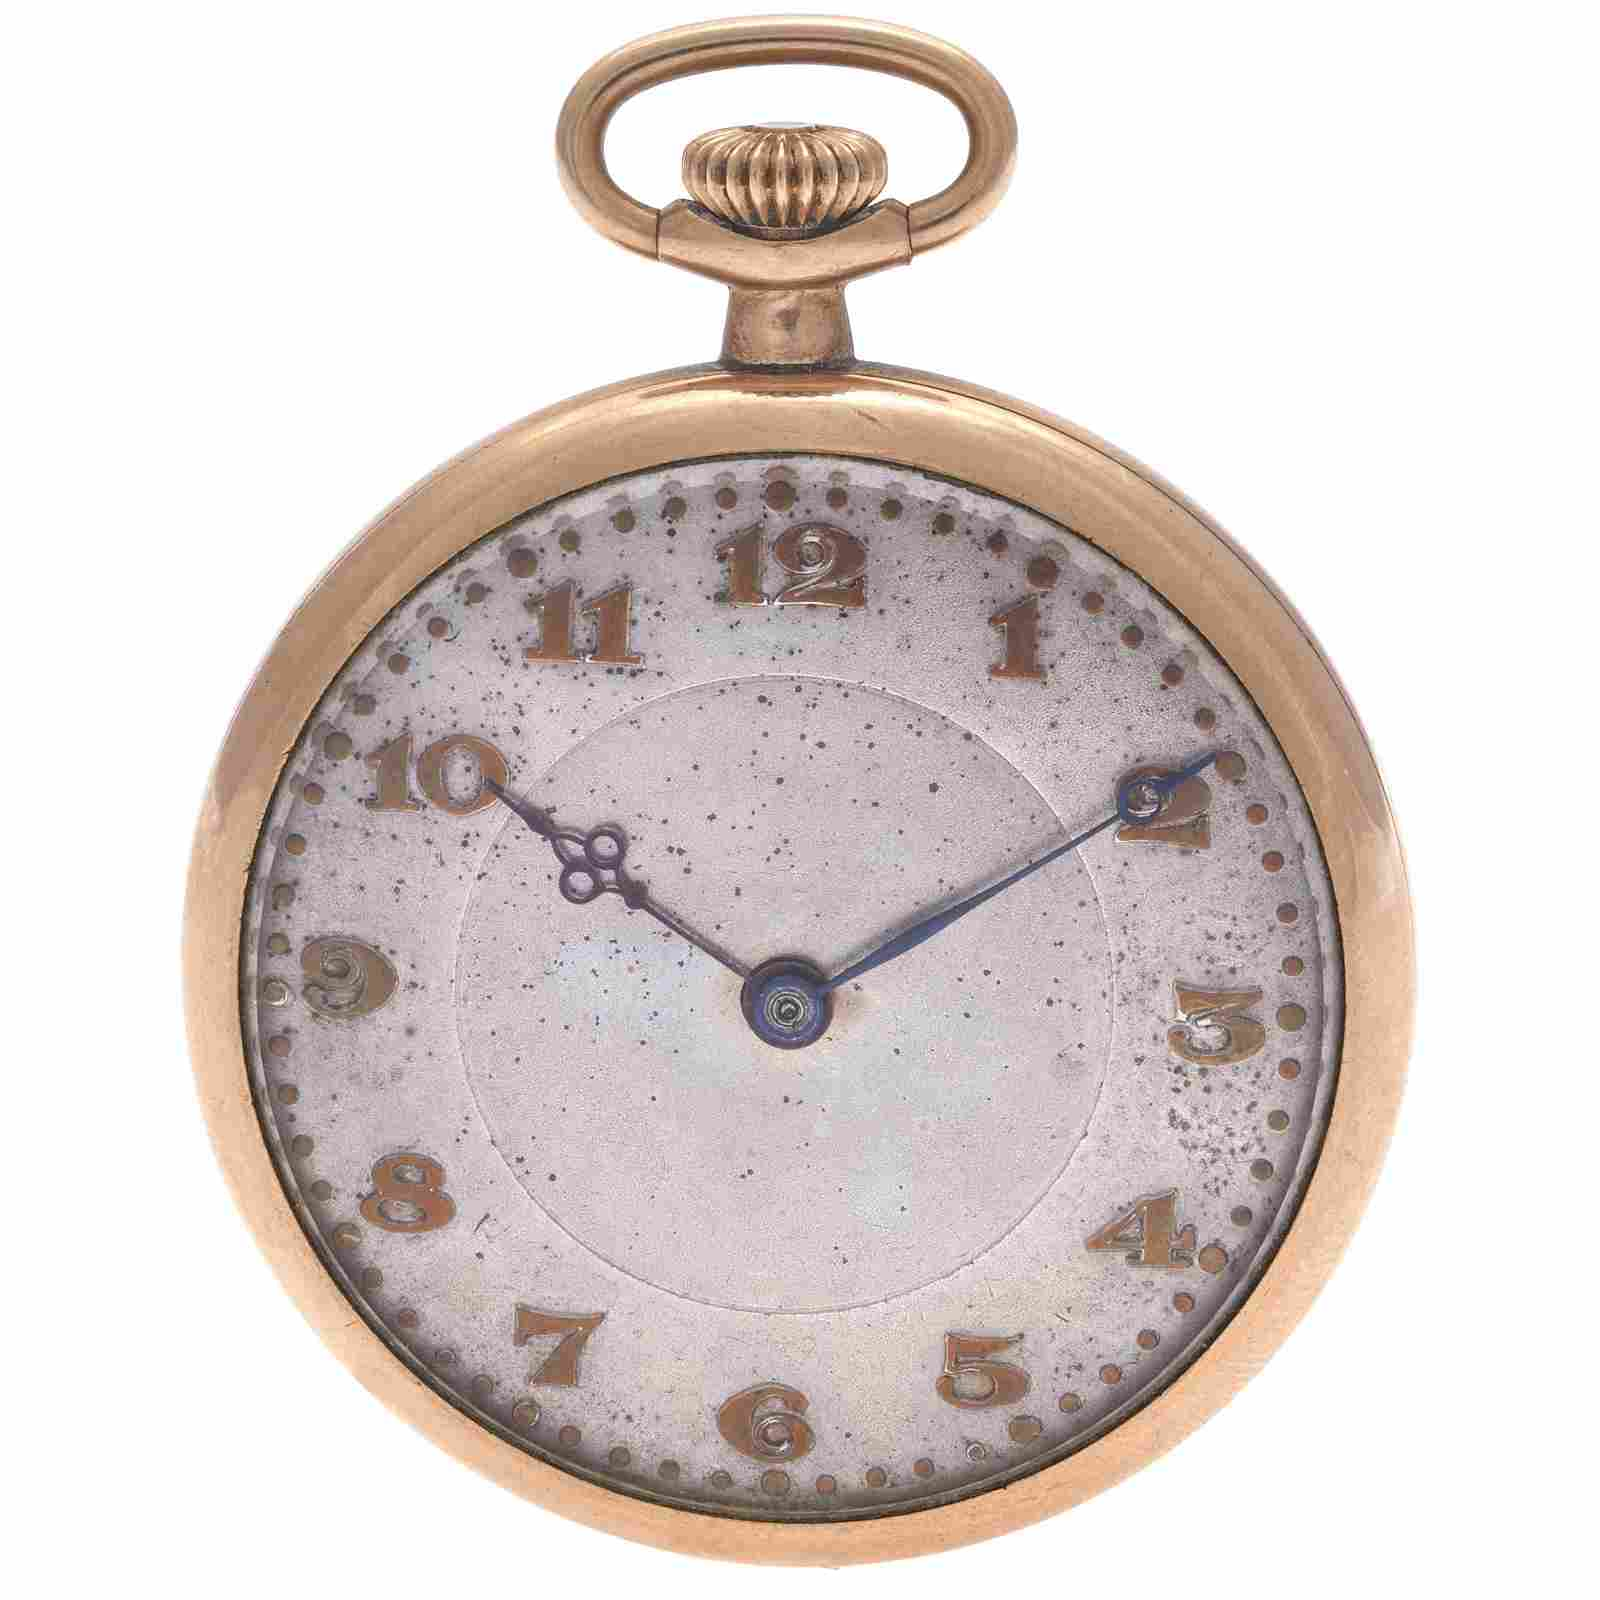 Tavennes Swiss Gold-Filled Pocket Watch